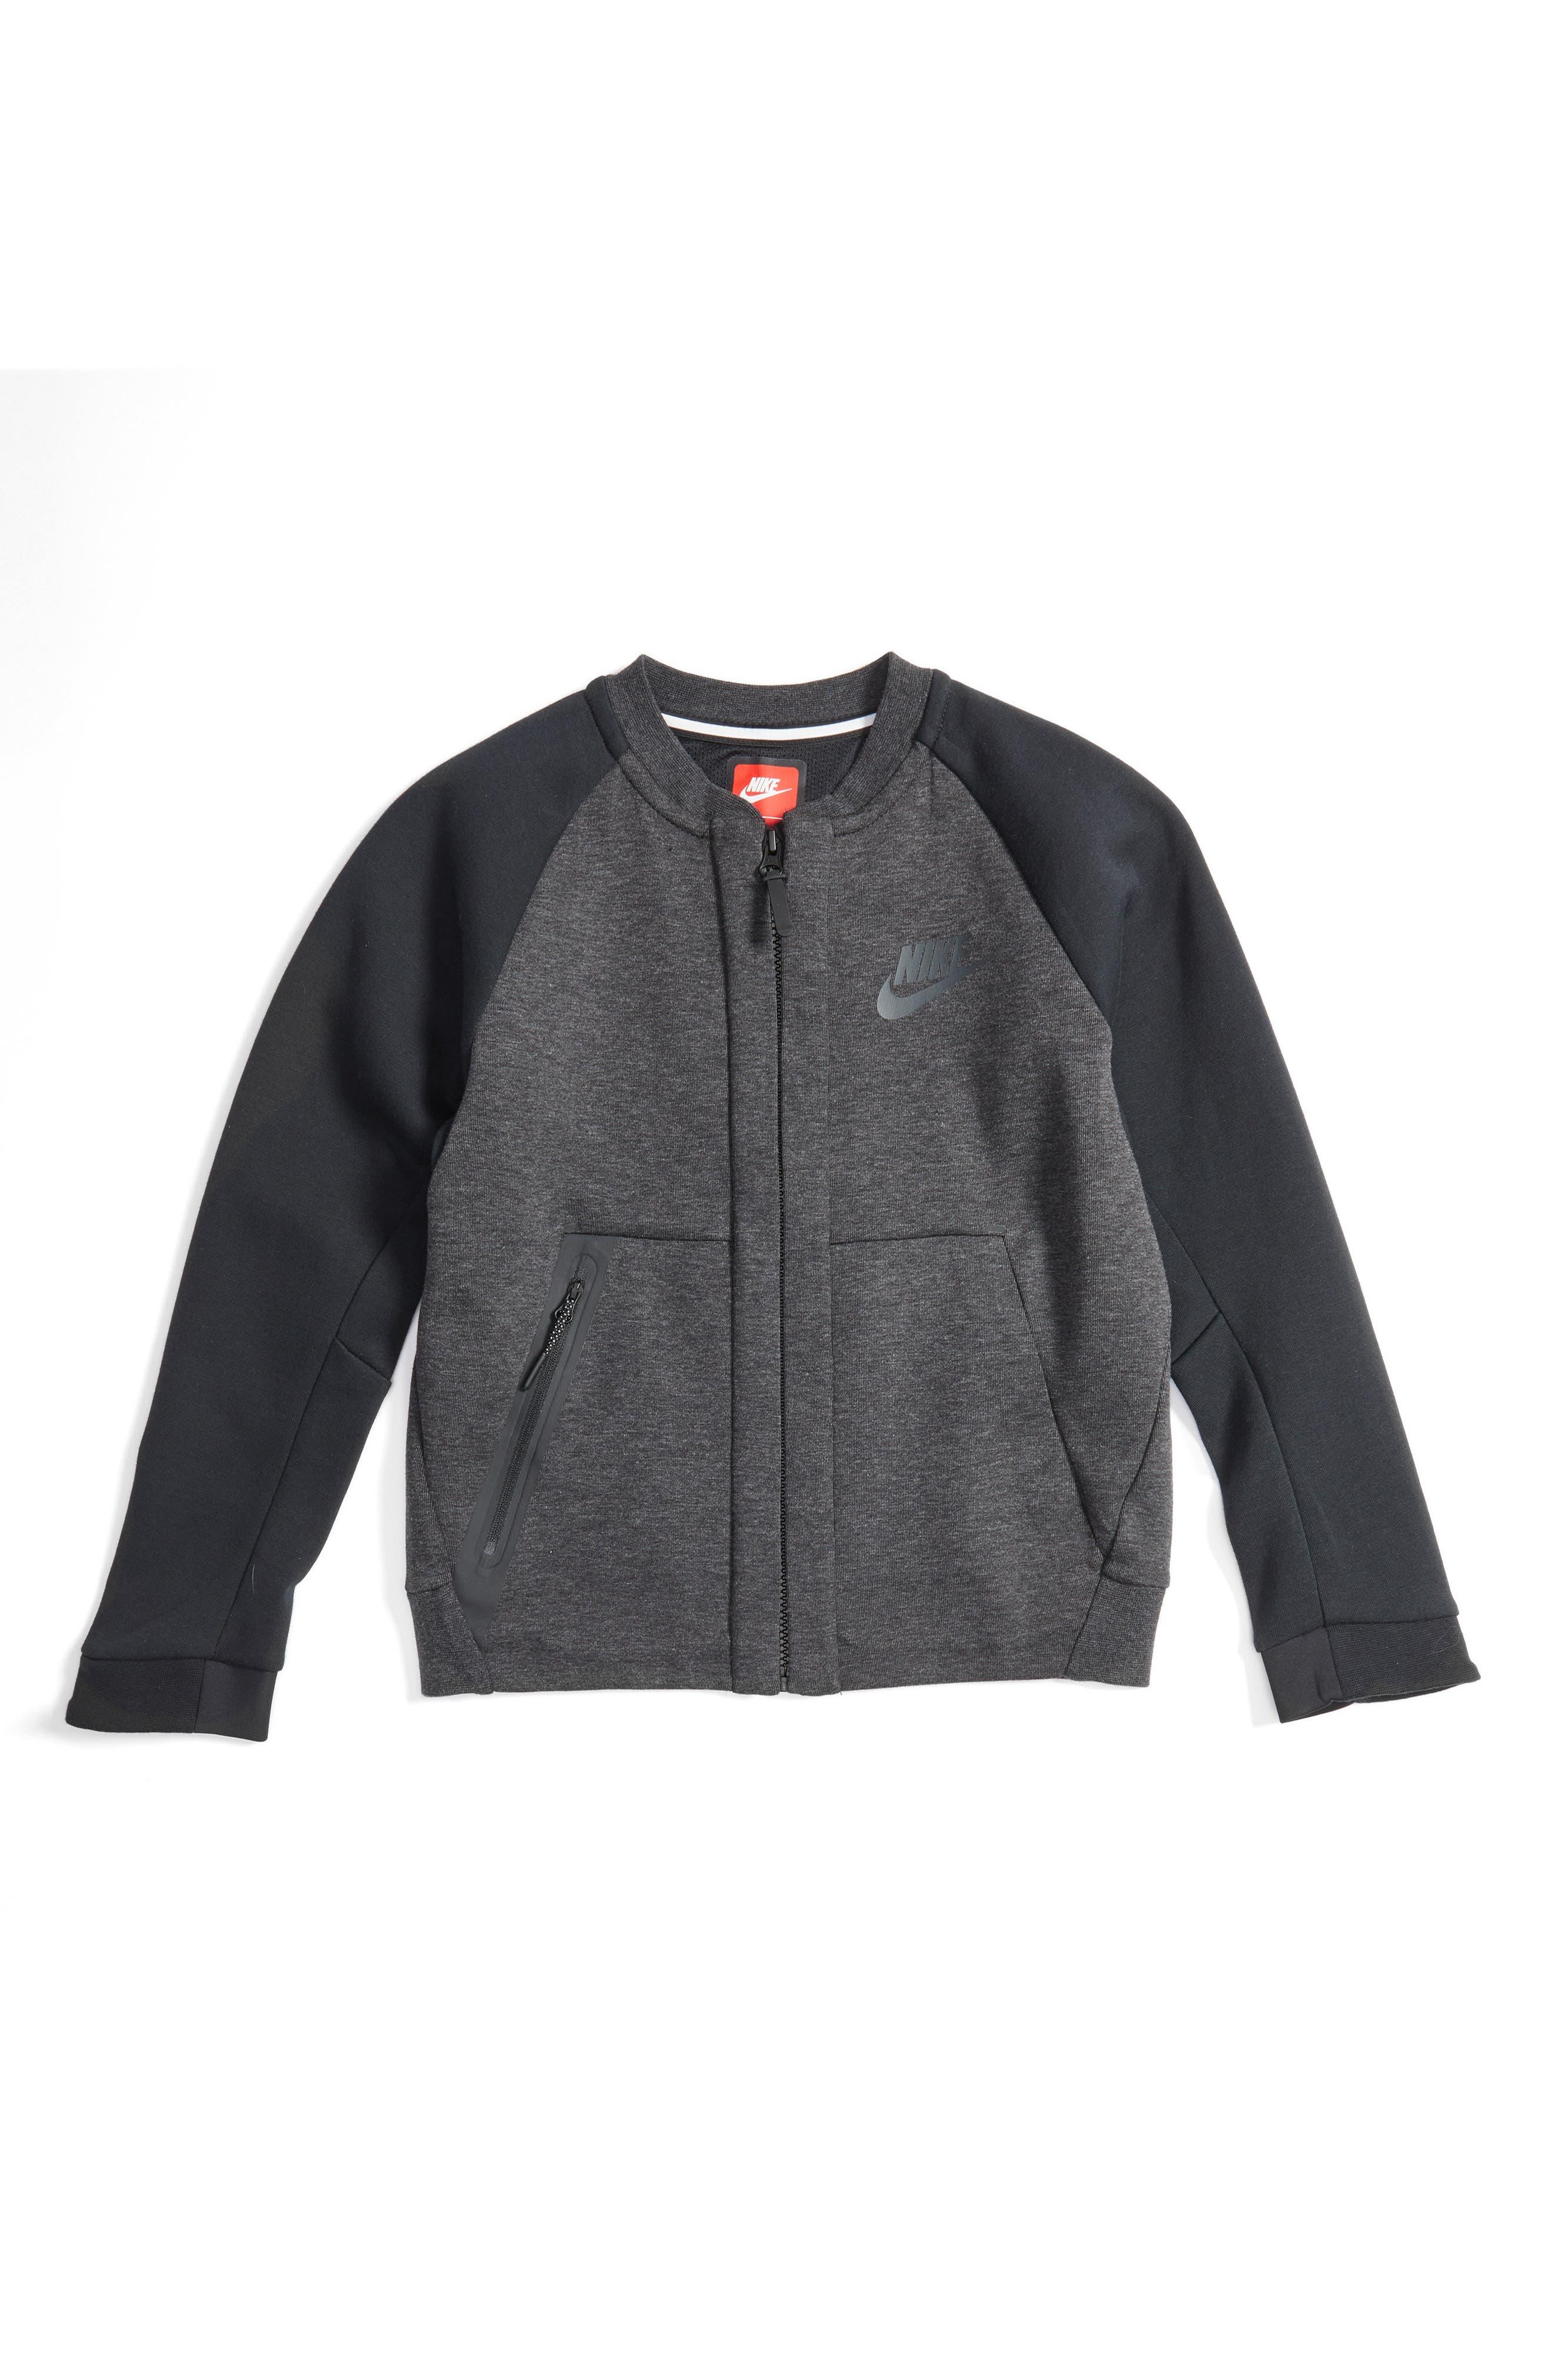 Sportswear Tech Fleece Bomber Jacket,                             Main thumbnail 1, color,                             Blk H/ Anthra